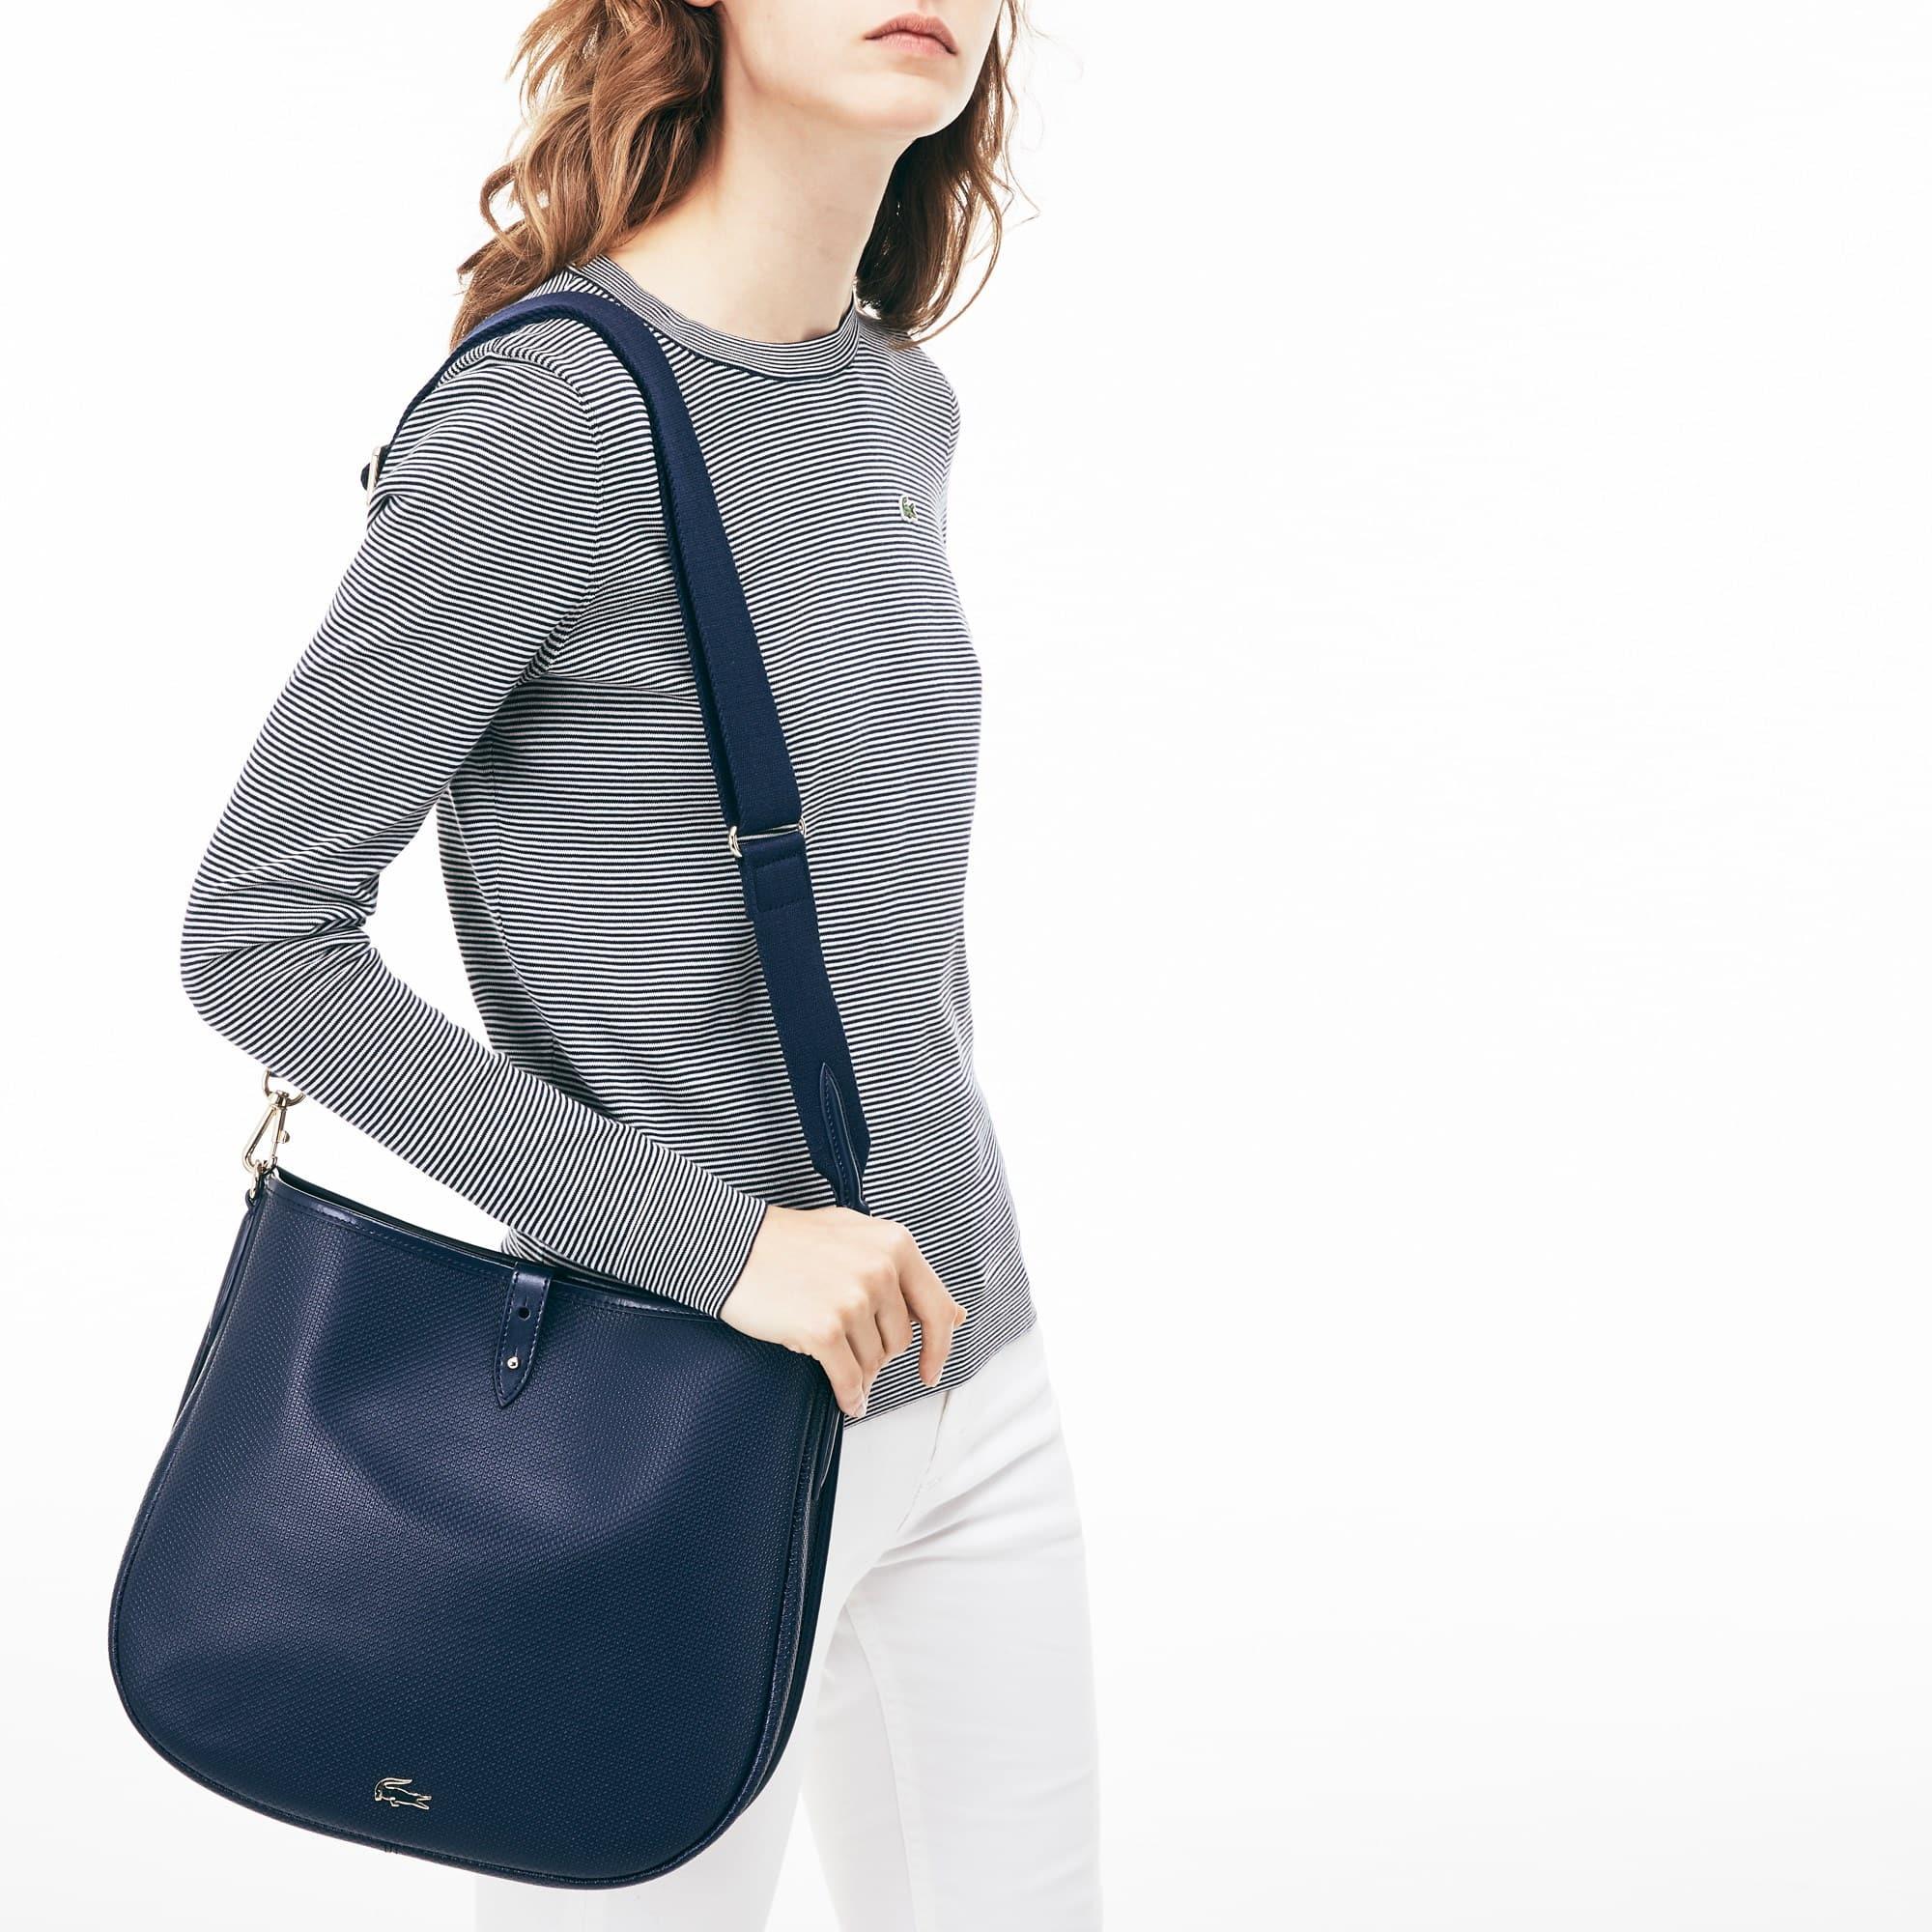 Women's Chantaco Piqué Leather Hobo Bag